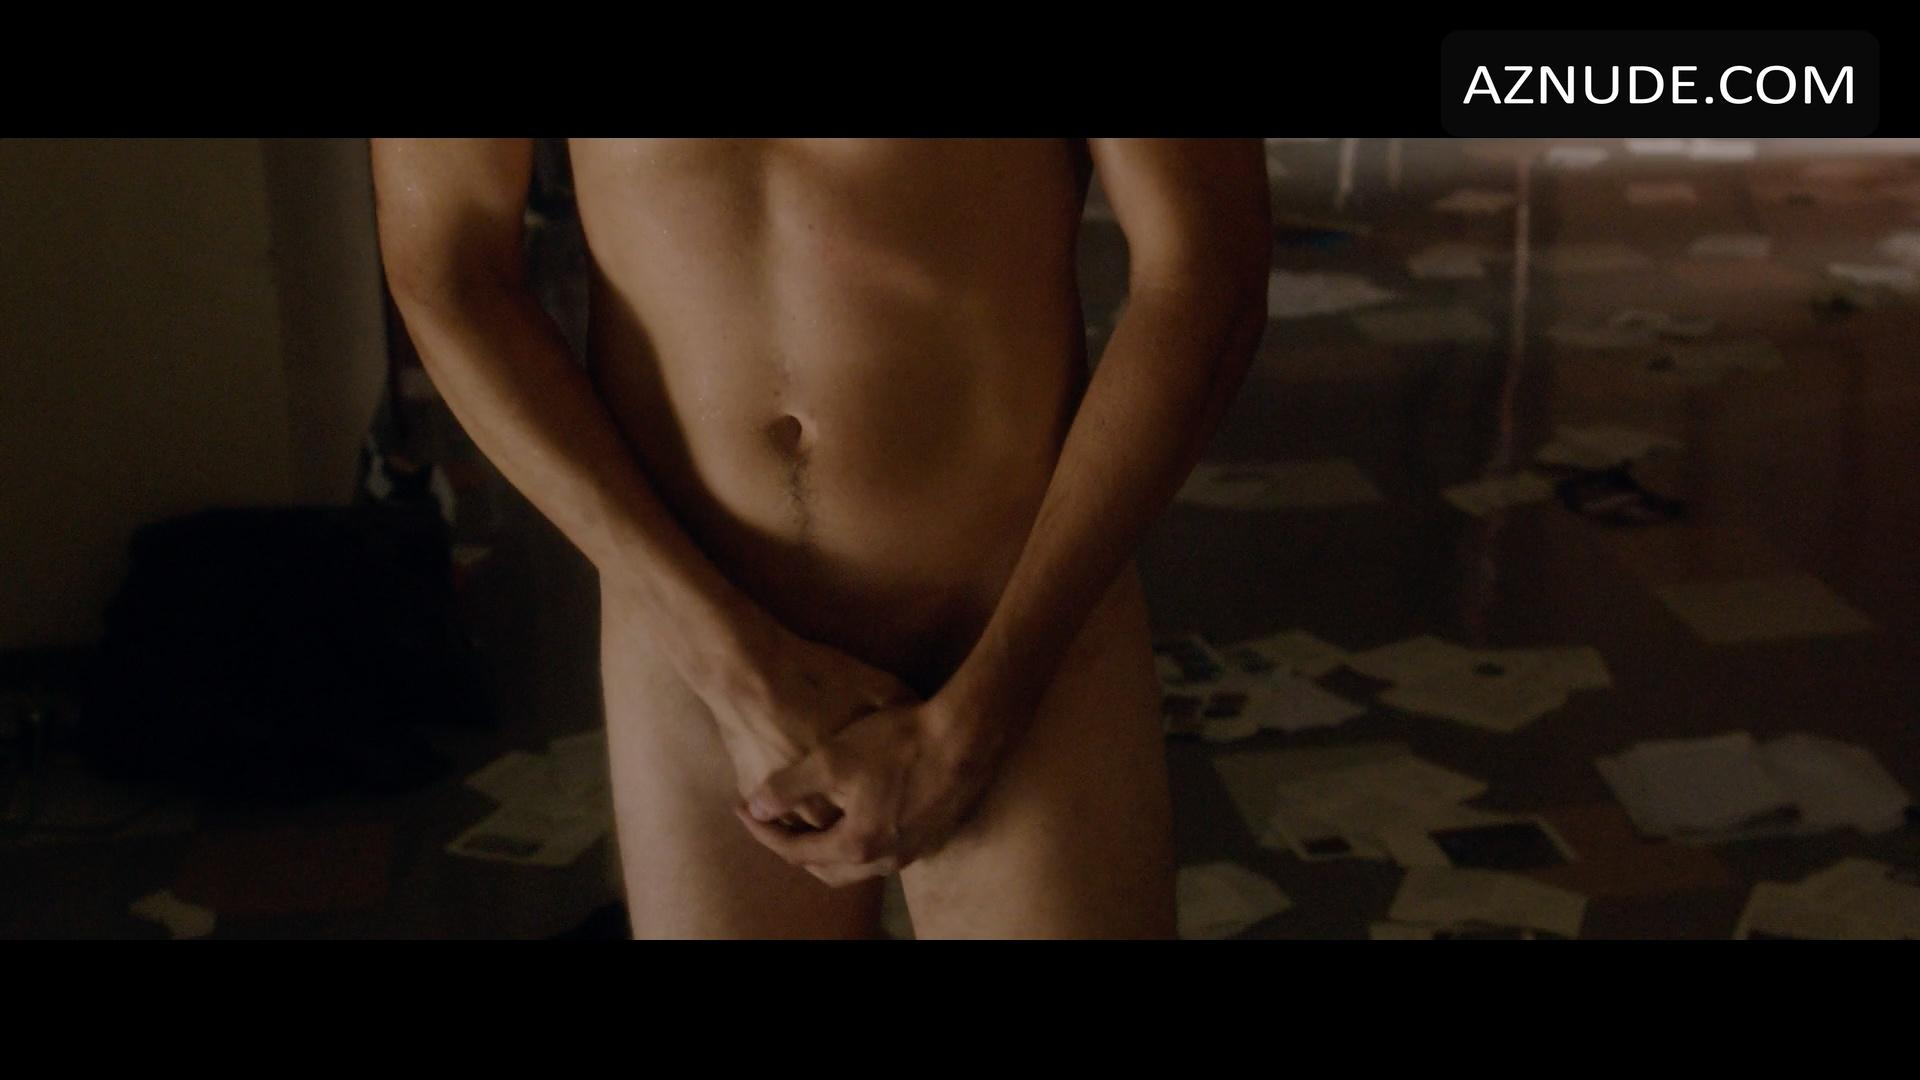 Naked Will Braun Gay  Hot Girl Hd Wallpaper-5612